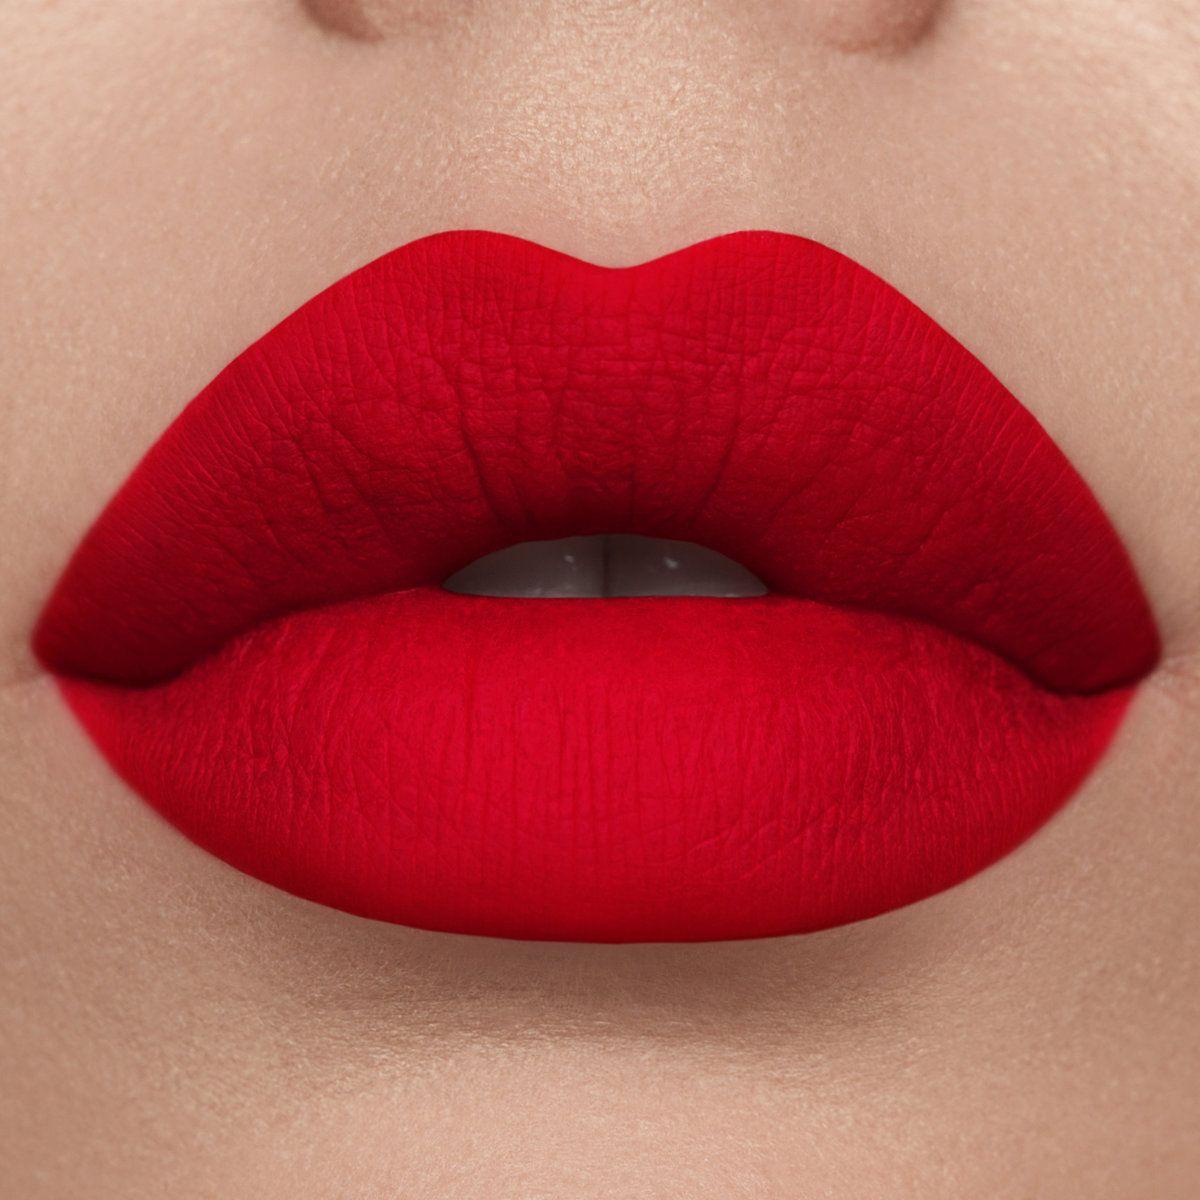 Red Velvet Matte Lipstick True Red In 2020 Red Lipsticks Lip